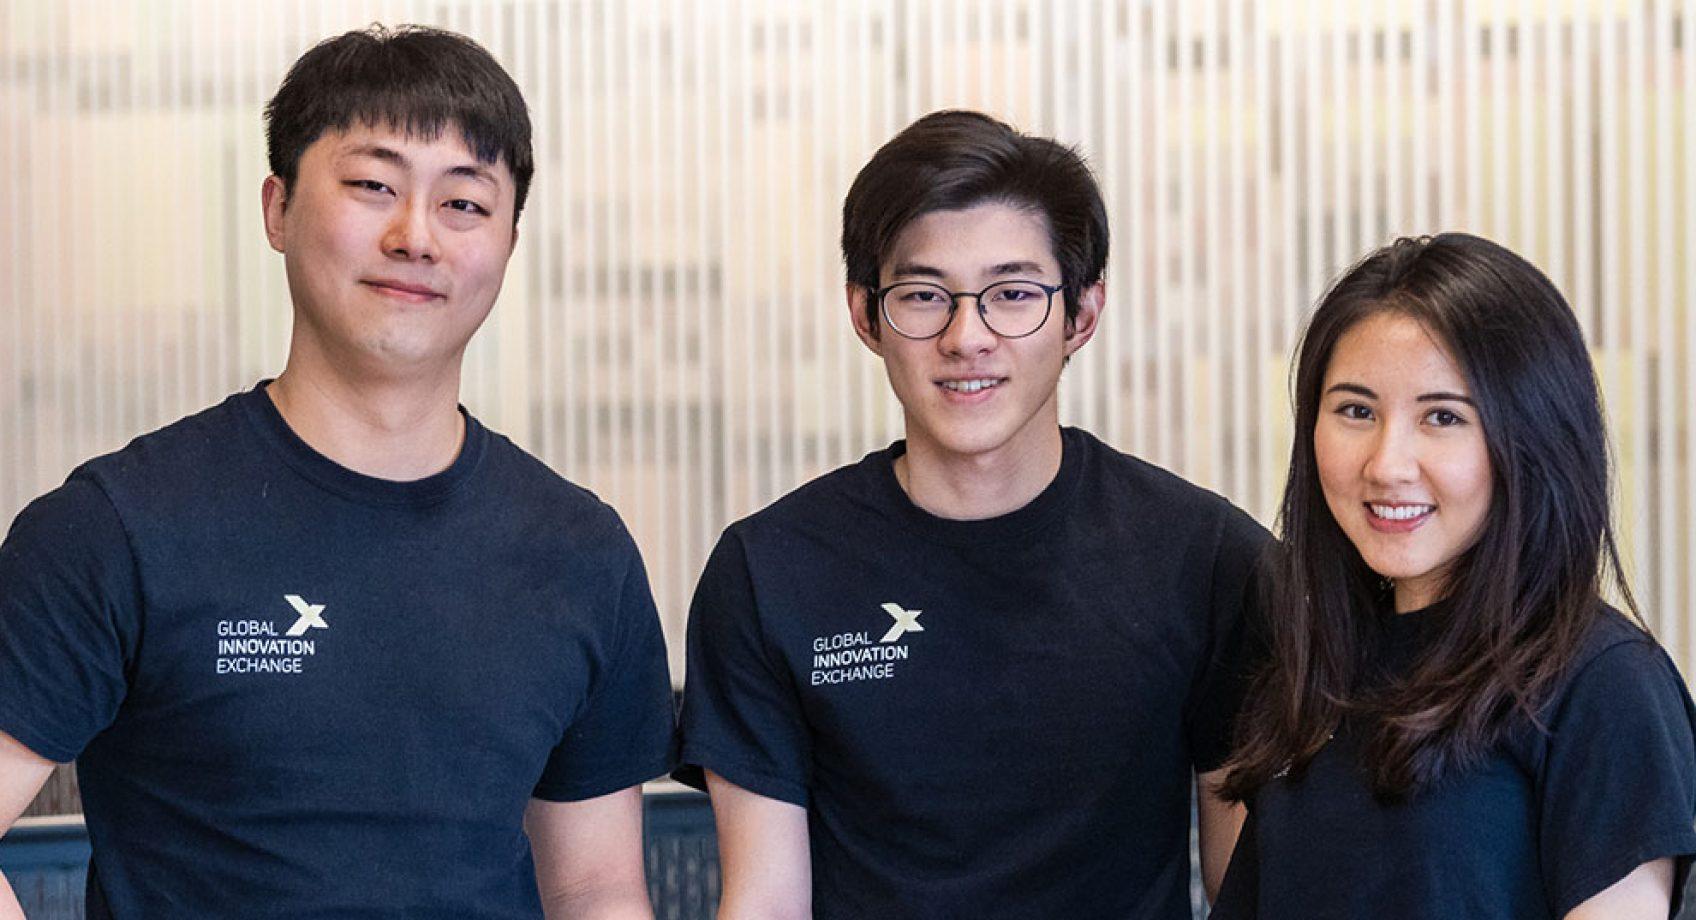 GIX student team